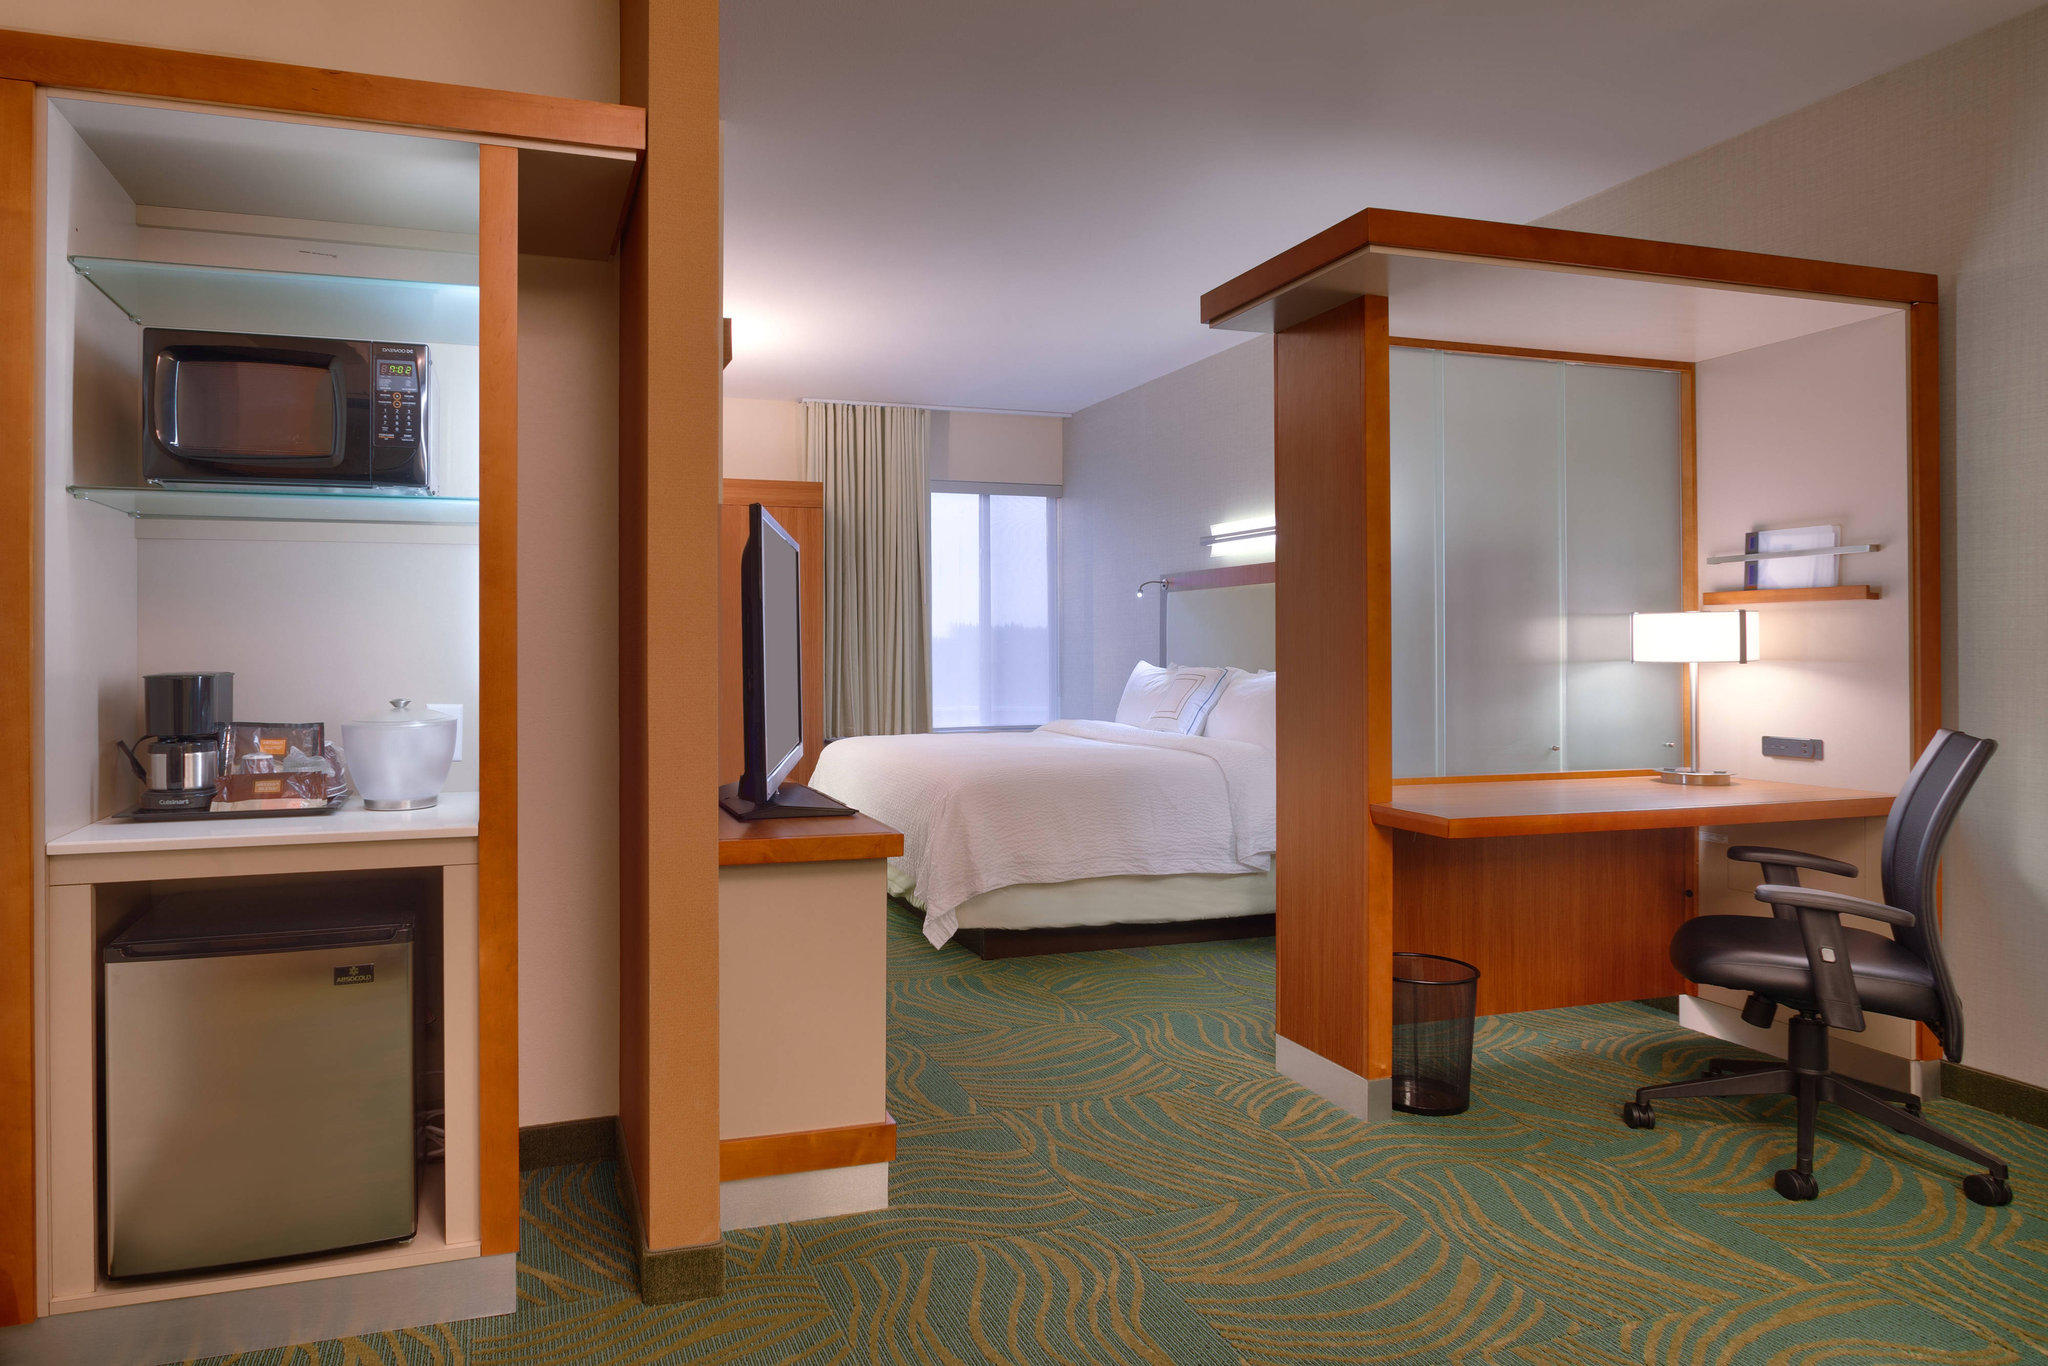 SpringHill Suites by Marriott Coeur d'Alene